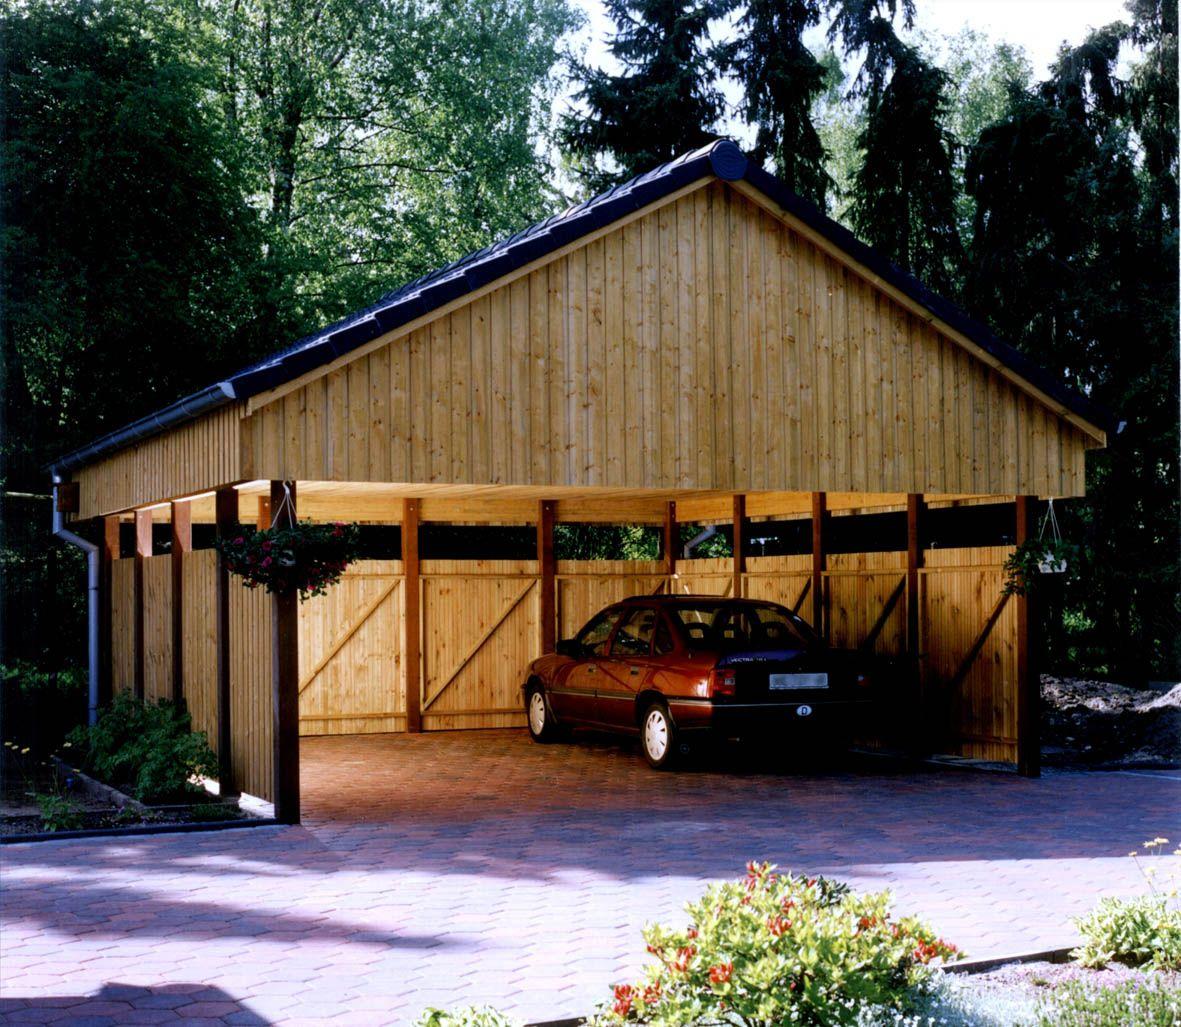 Euro Carport Ca 6 4x6 4 M Kosten Bausatz Ca 11 500 Euro Montage Ca 4 300 Euro House Styles Carport Outdoor Structures